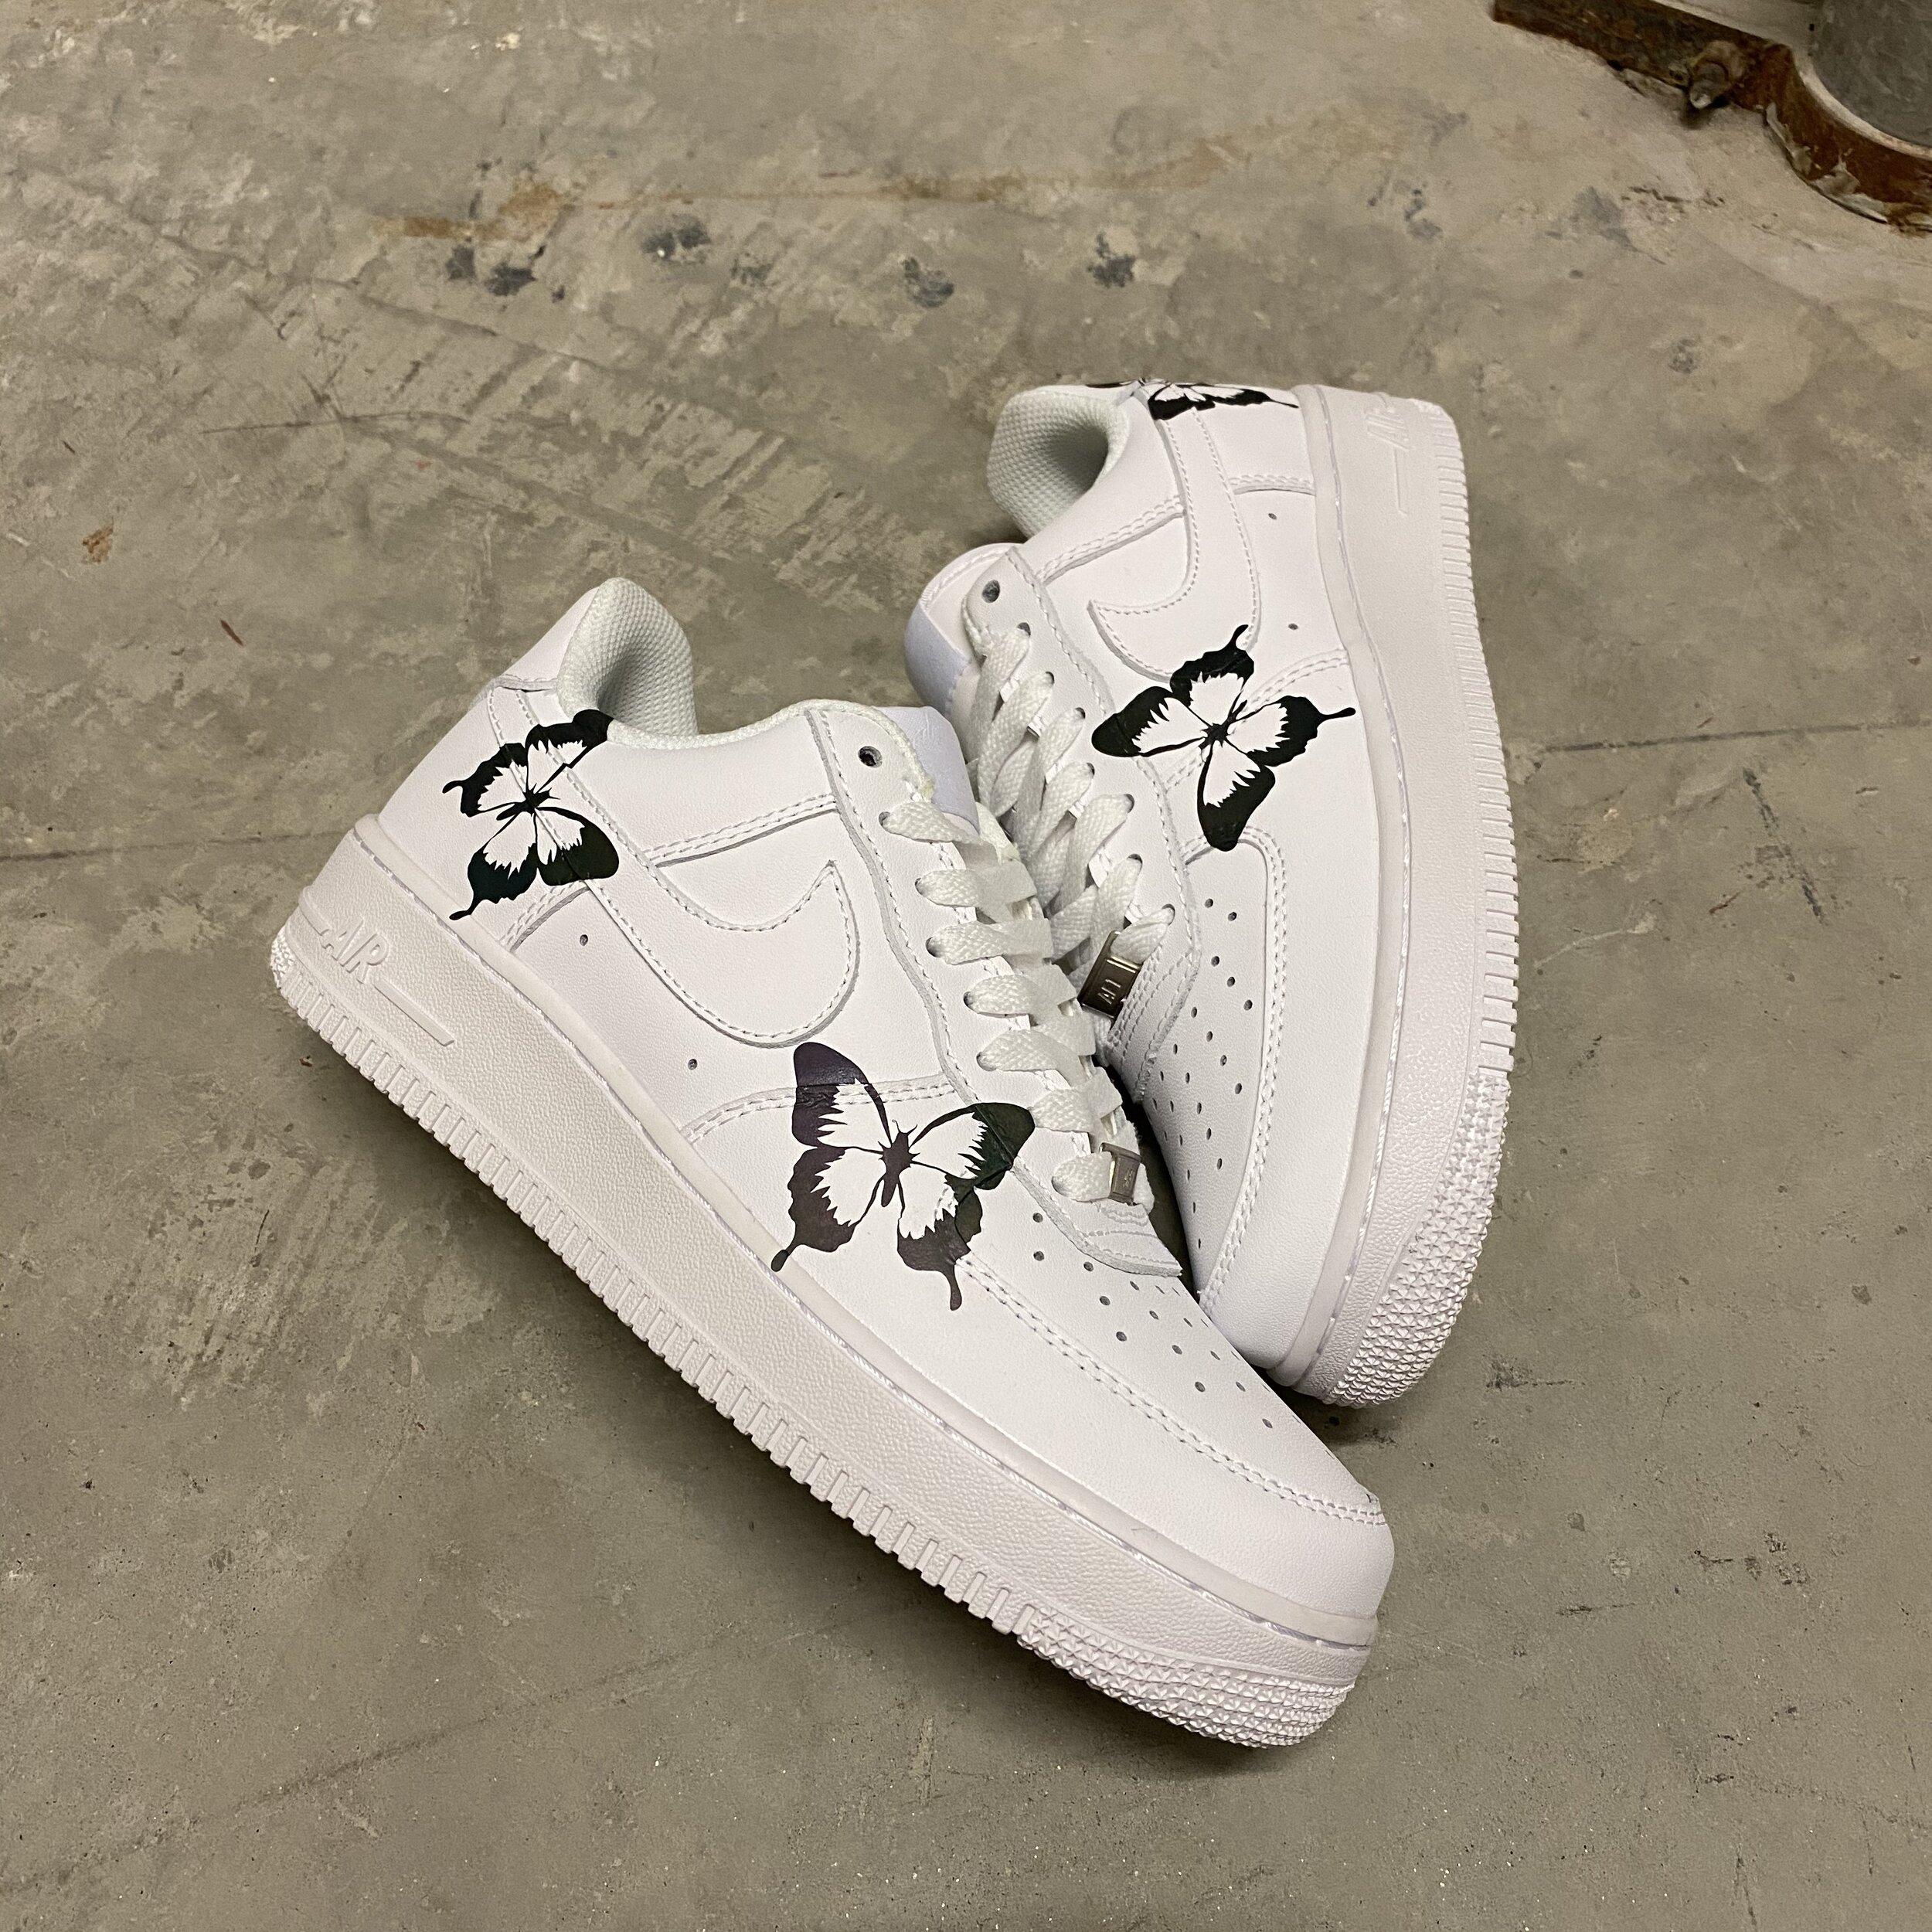 air force 1 custom of white